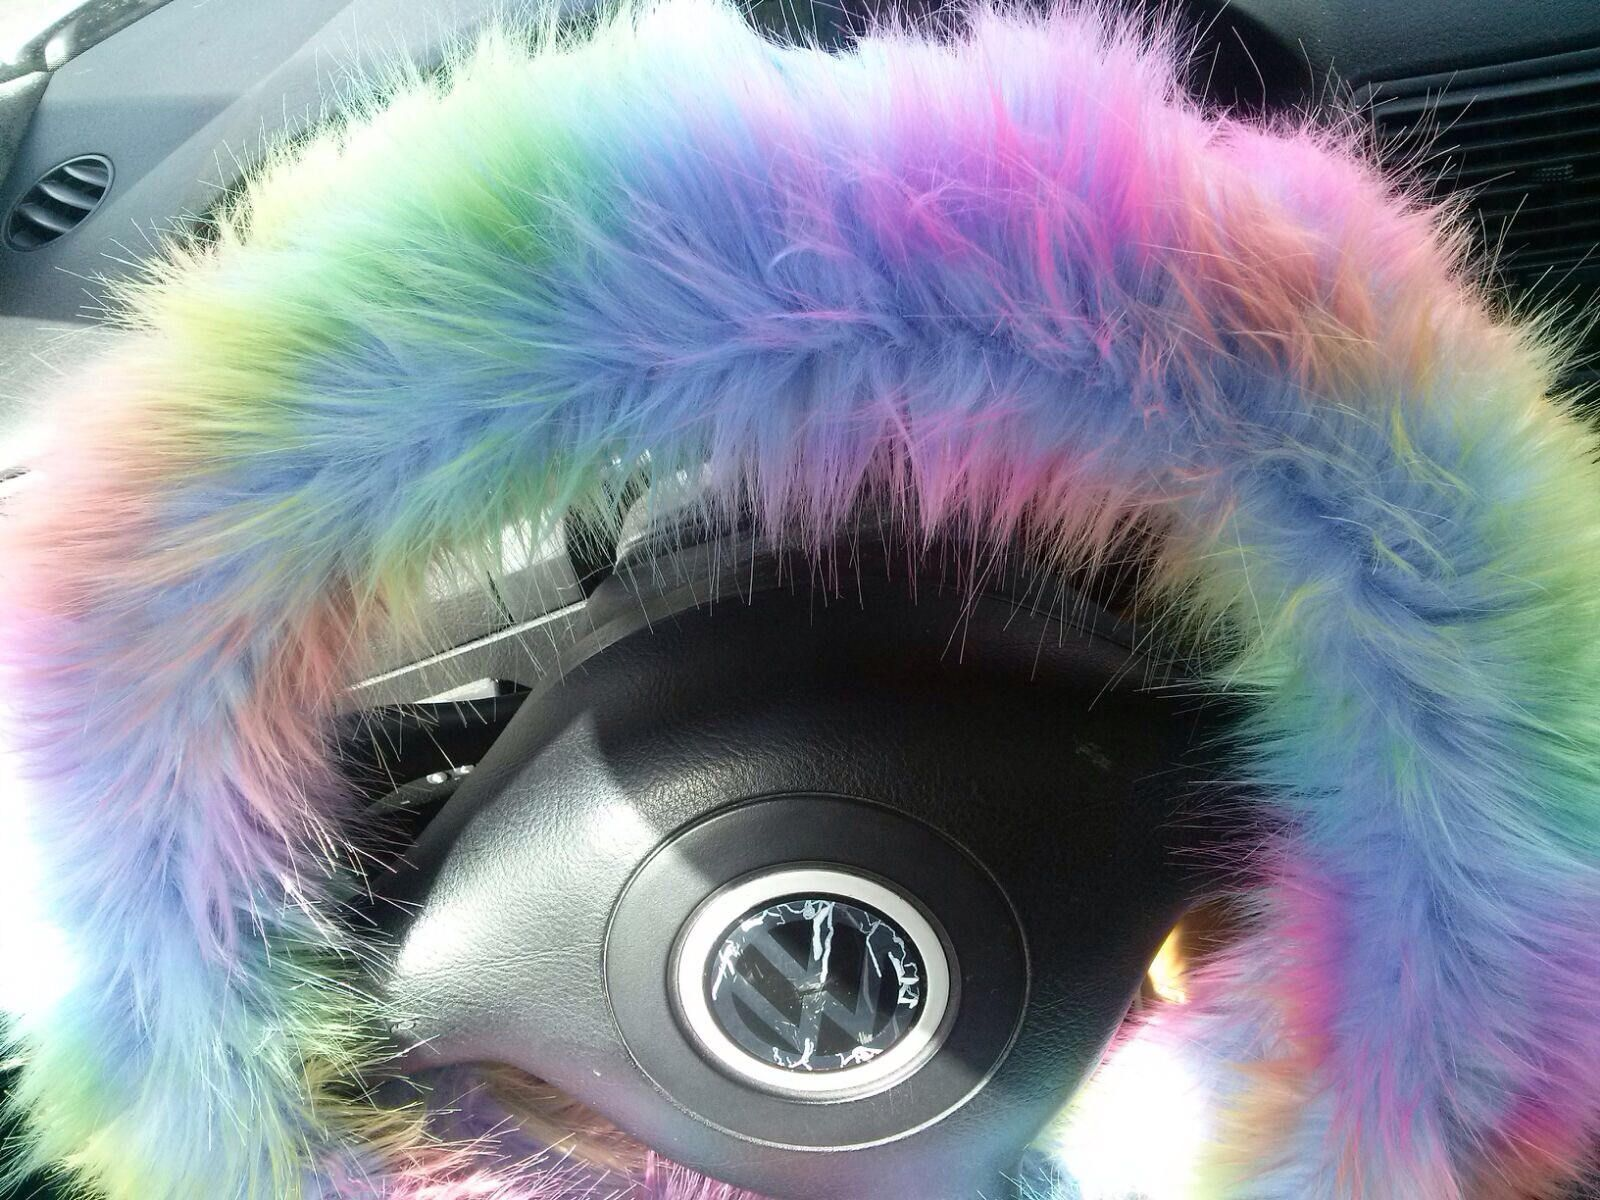 Fuzzy Car Accessories, Steering Wheel Cover, Gear Shift Knob